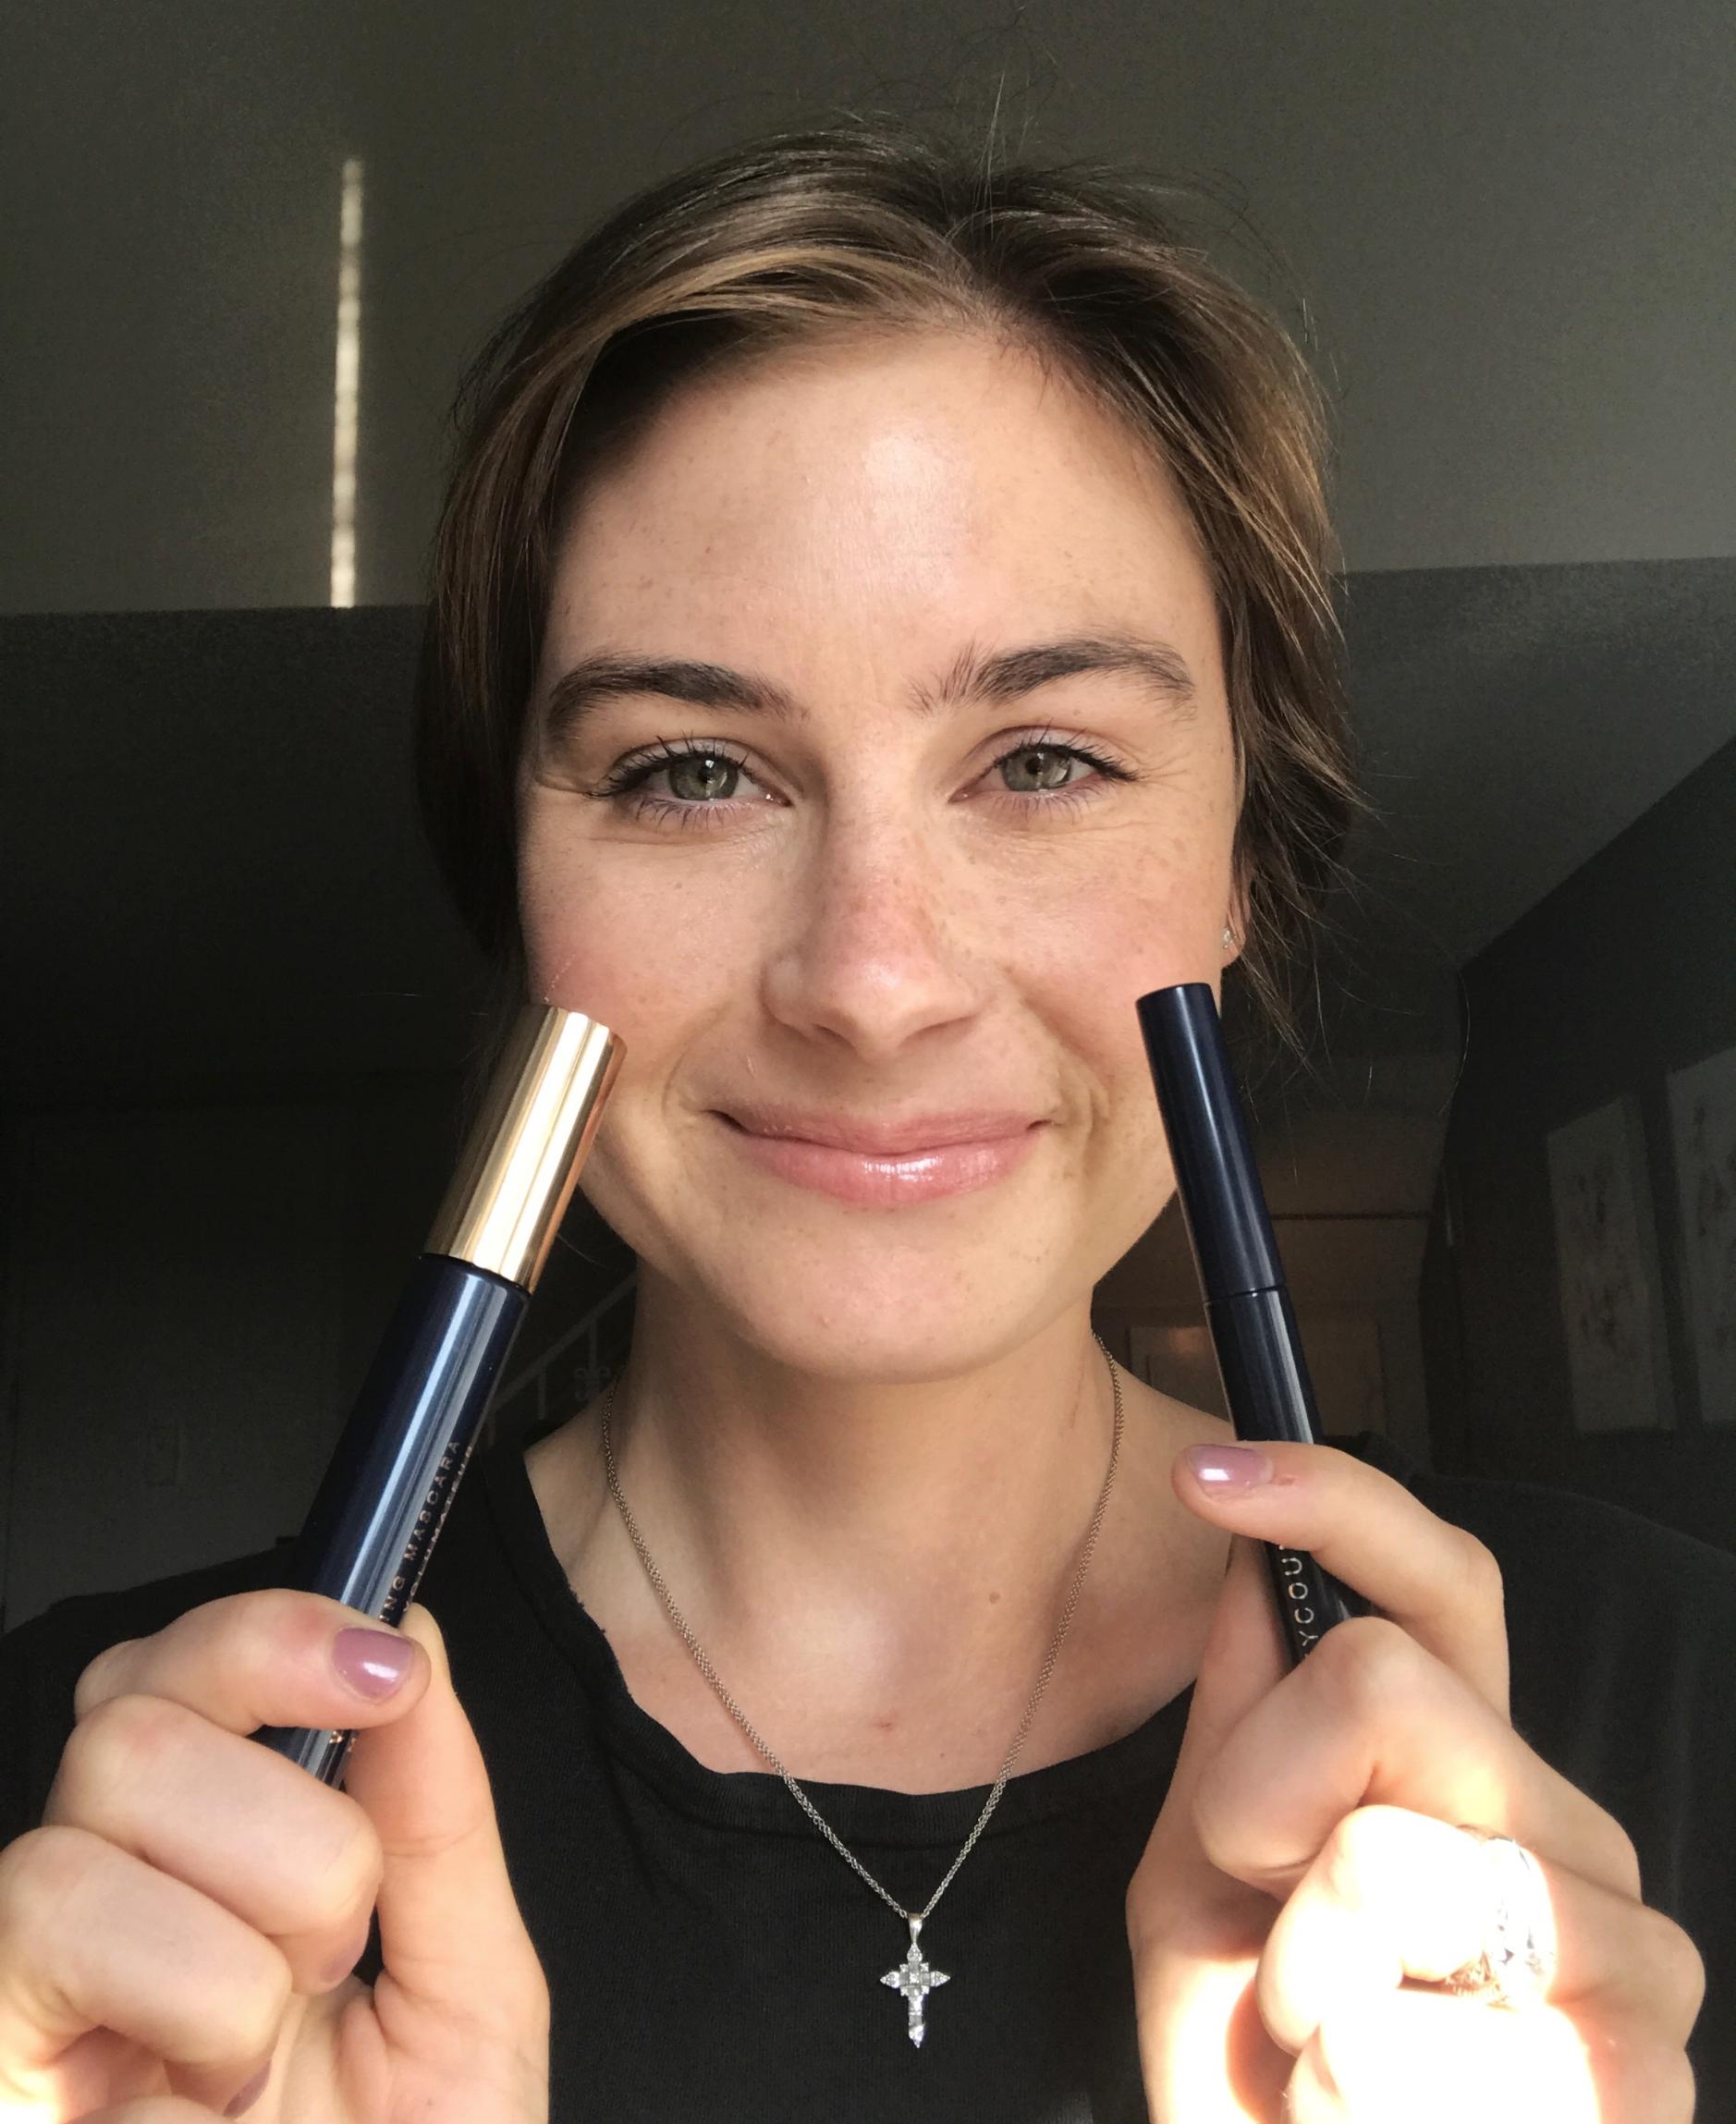 580df7735bc Beautycounter Mascara: Safe and Effective — Detox Me Tuesday